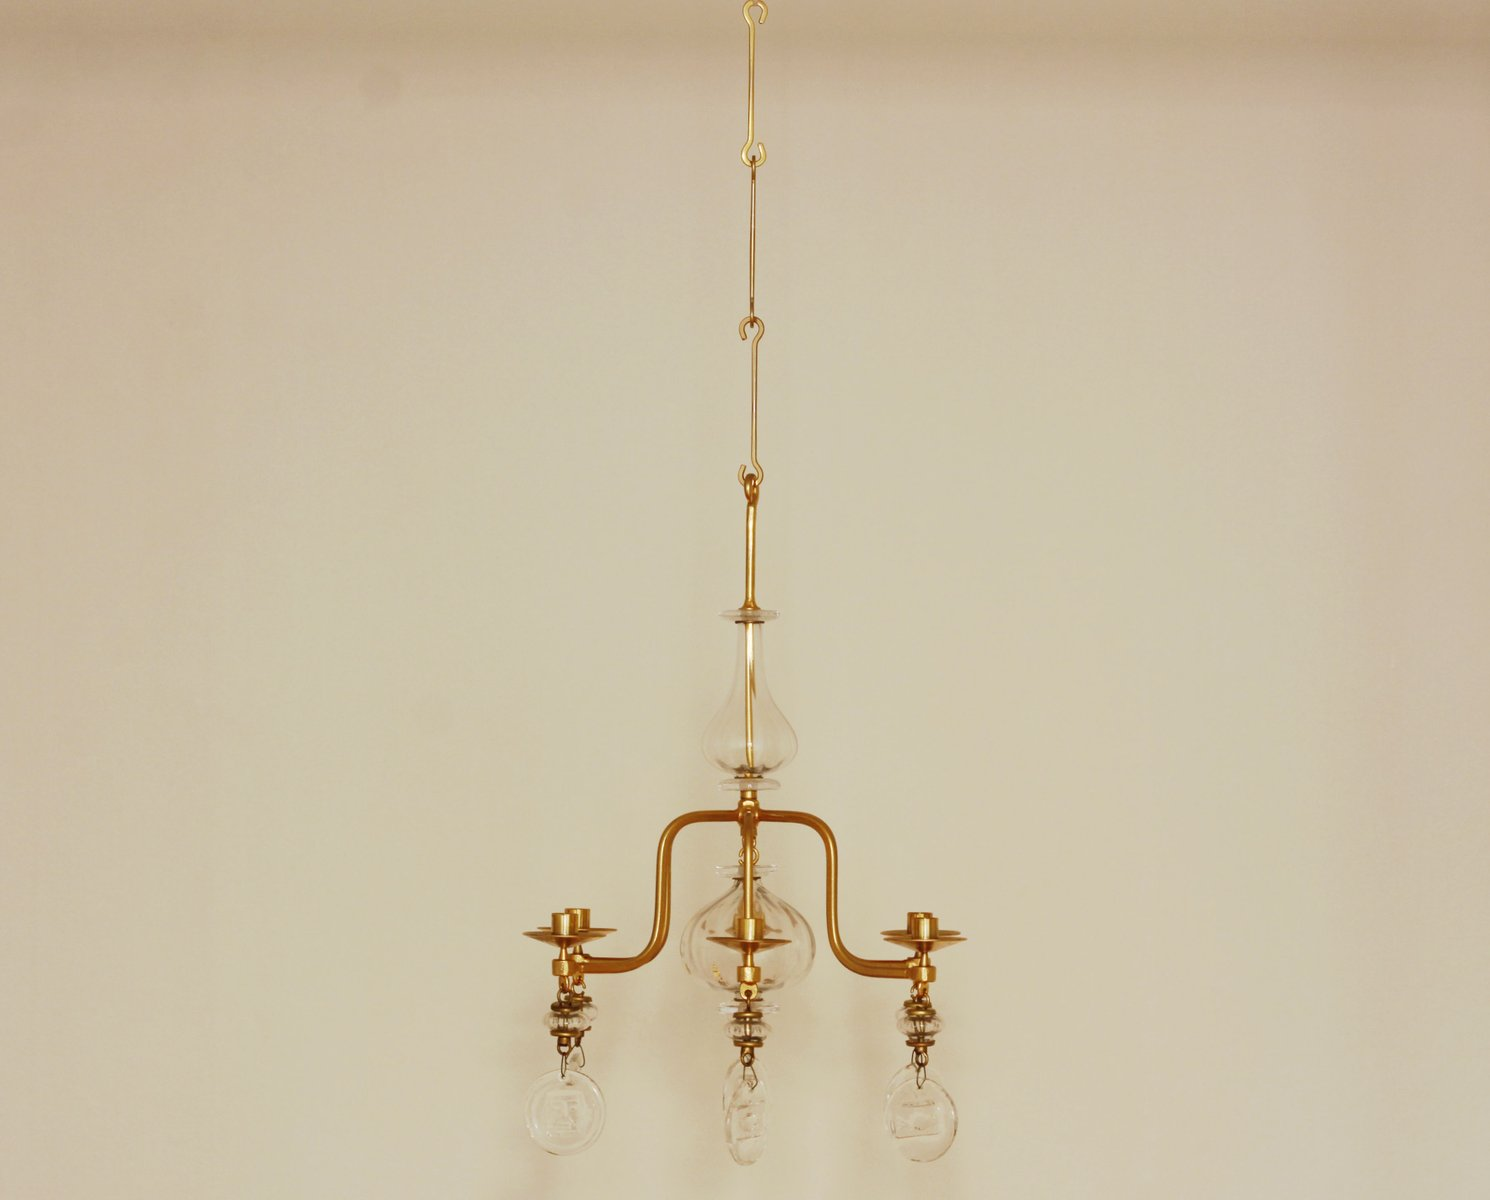 gro er mid century kerzen kronleuchter aus vergoldetem. Black Bedroom Furniture Sets. Home Design Ideas